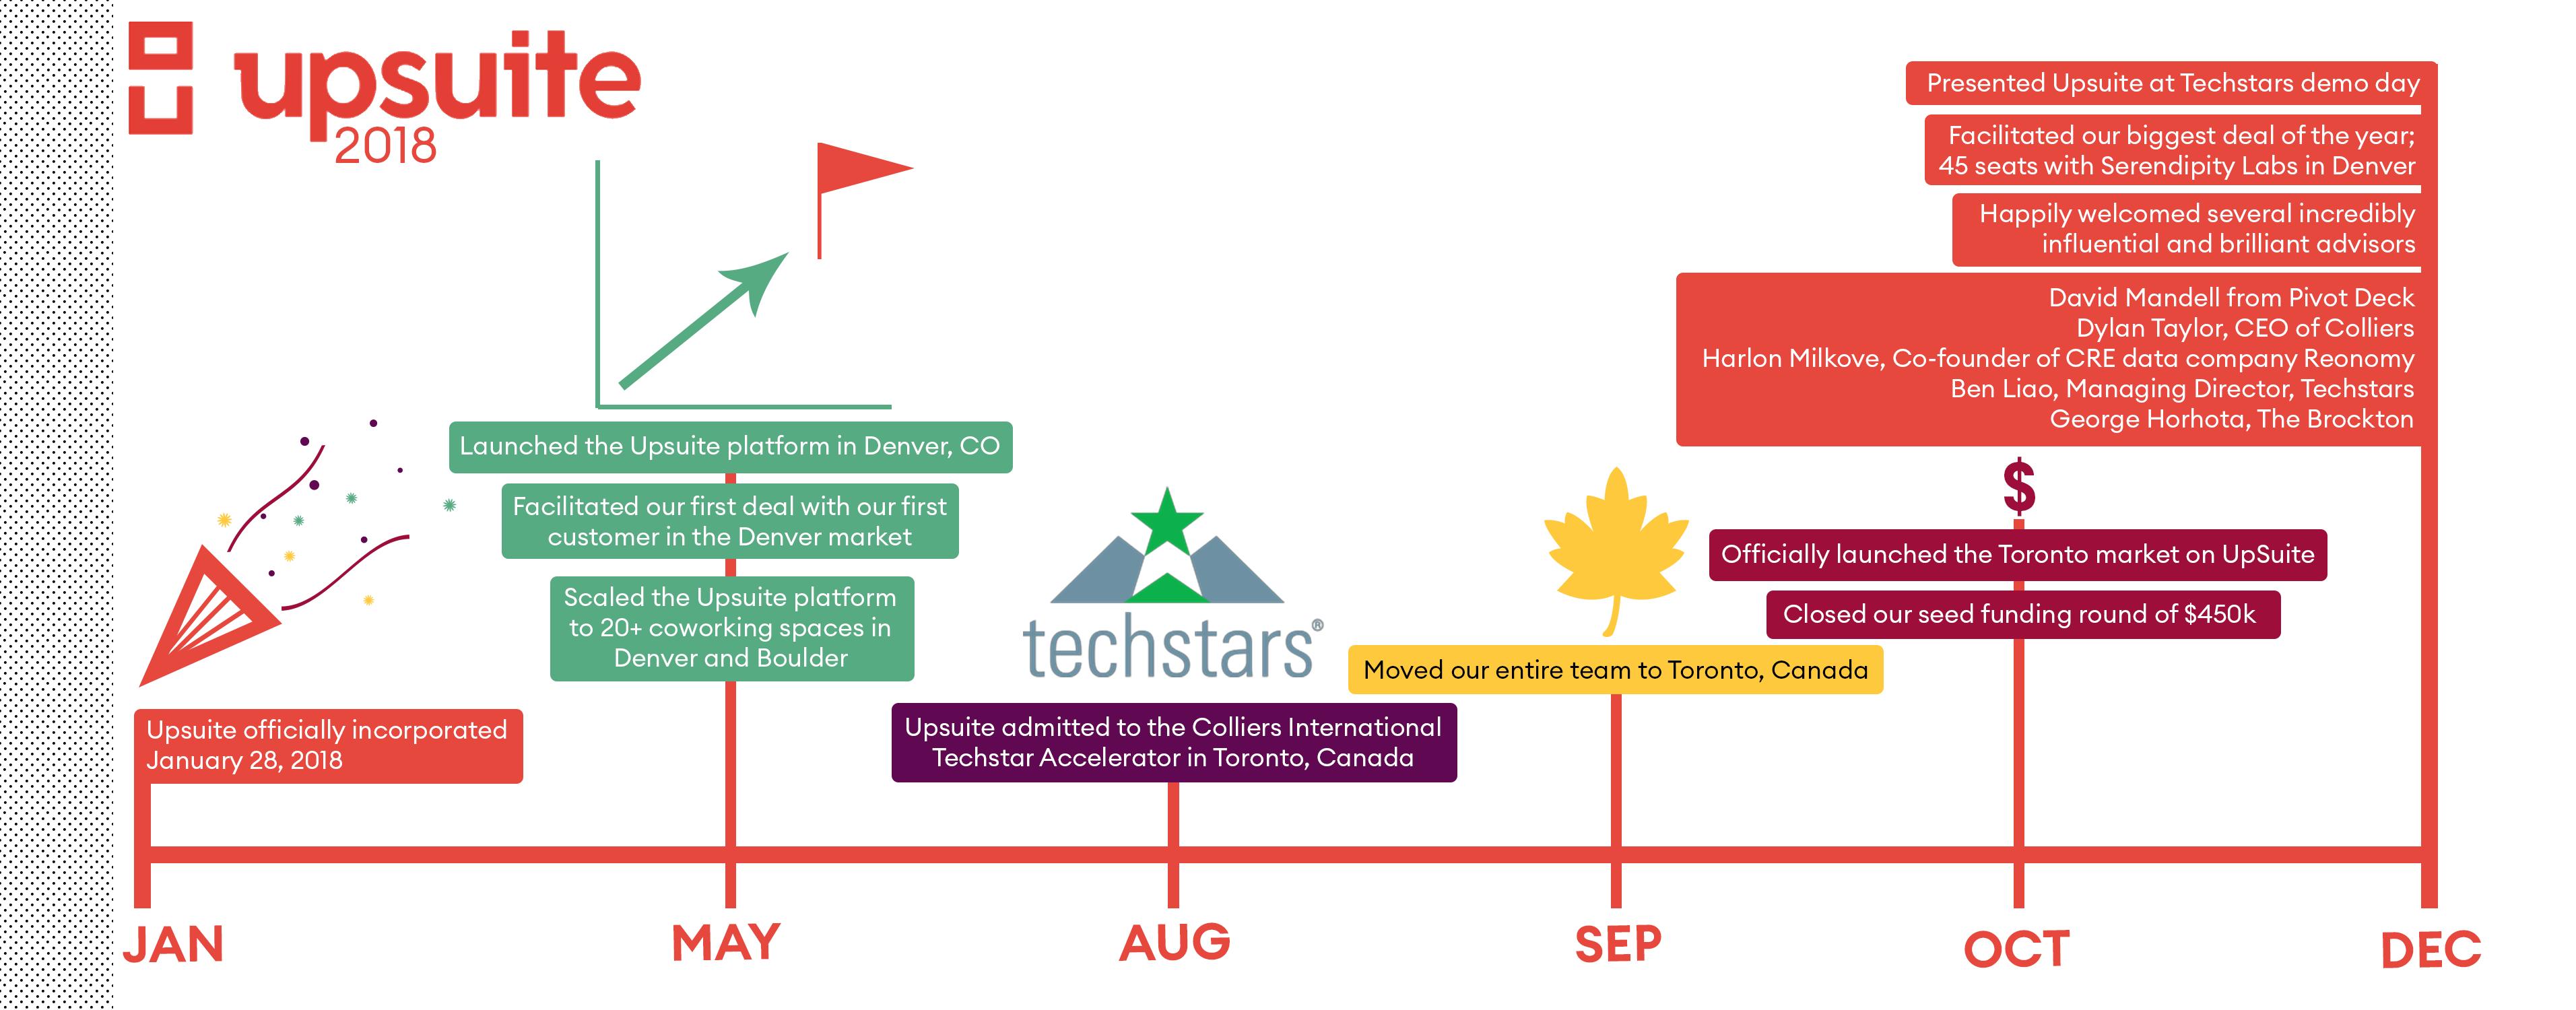 Upsuite Coworking Marketplace 2018 Timeline